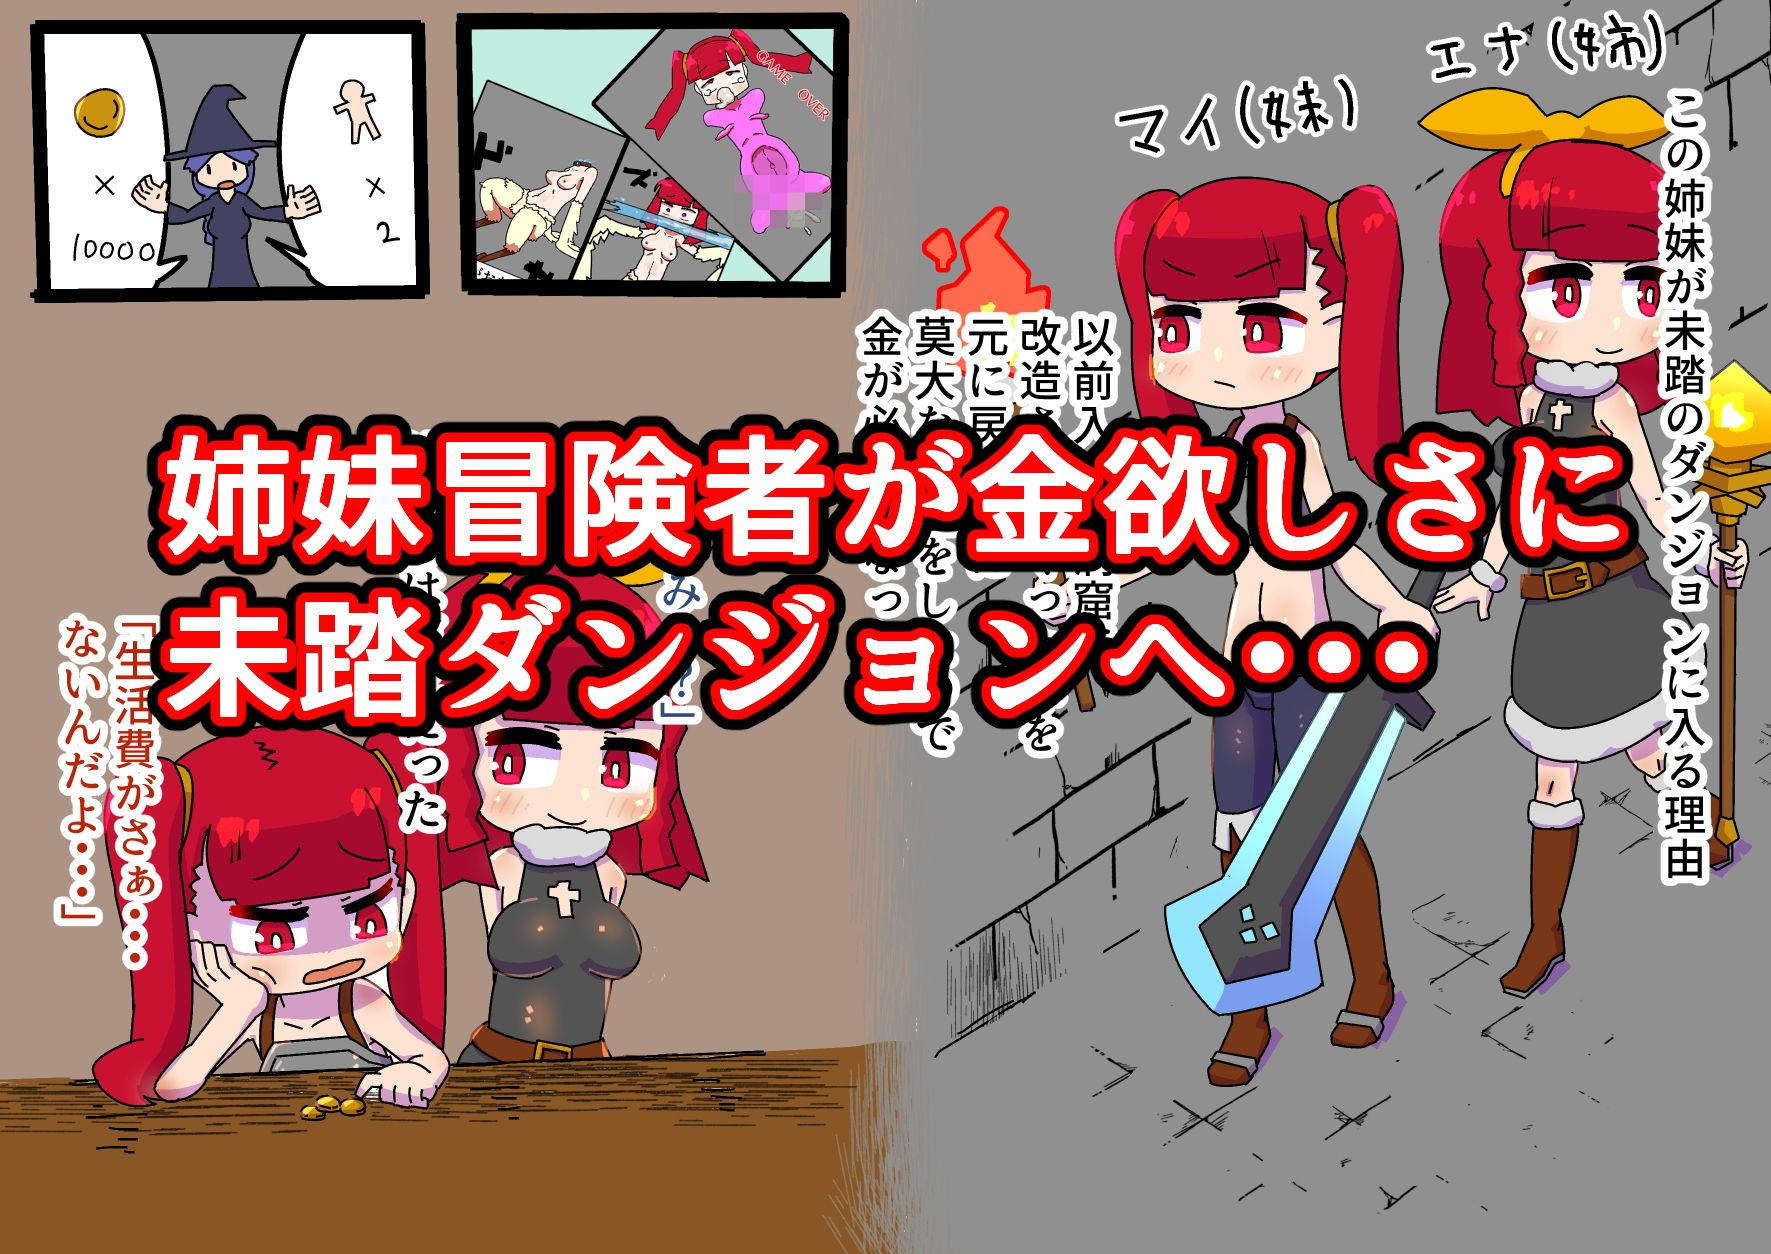 Re:姉妹冒険者が挑むエロトラップダンジョン